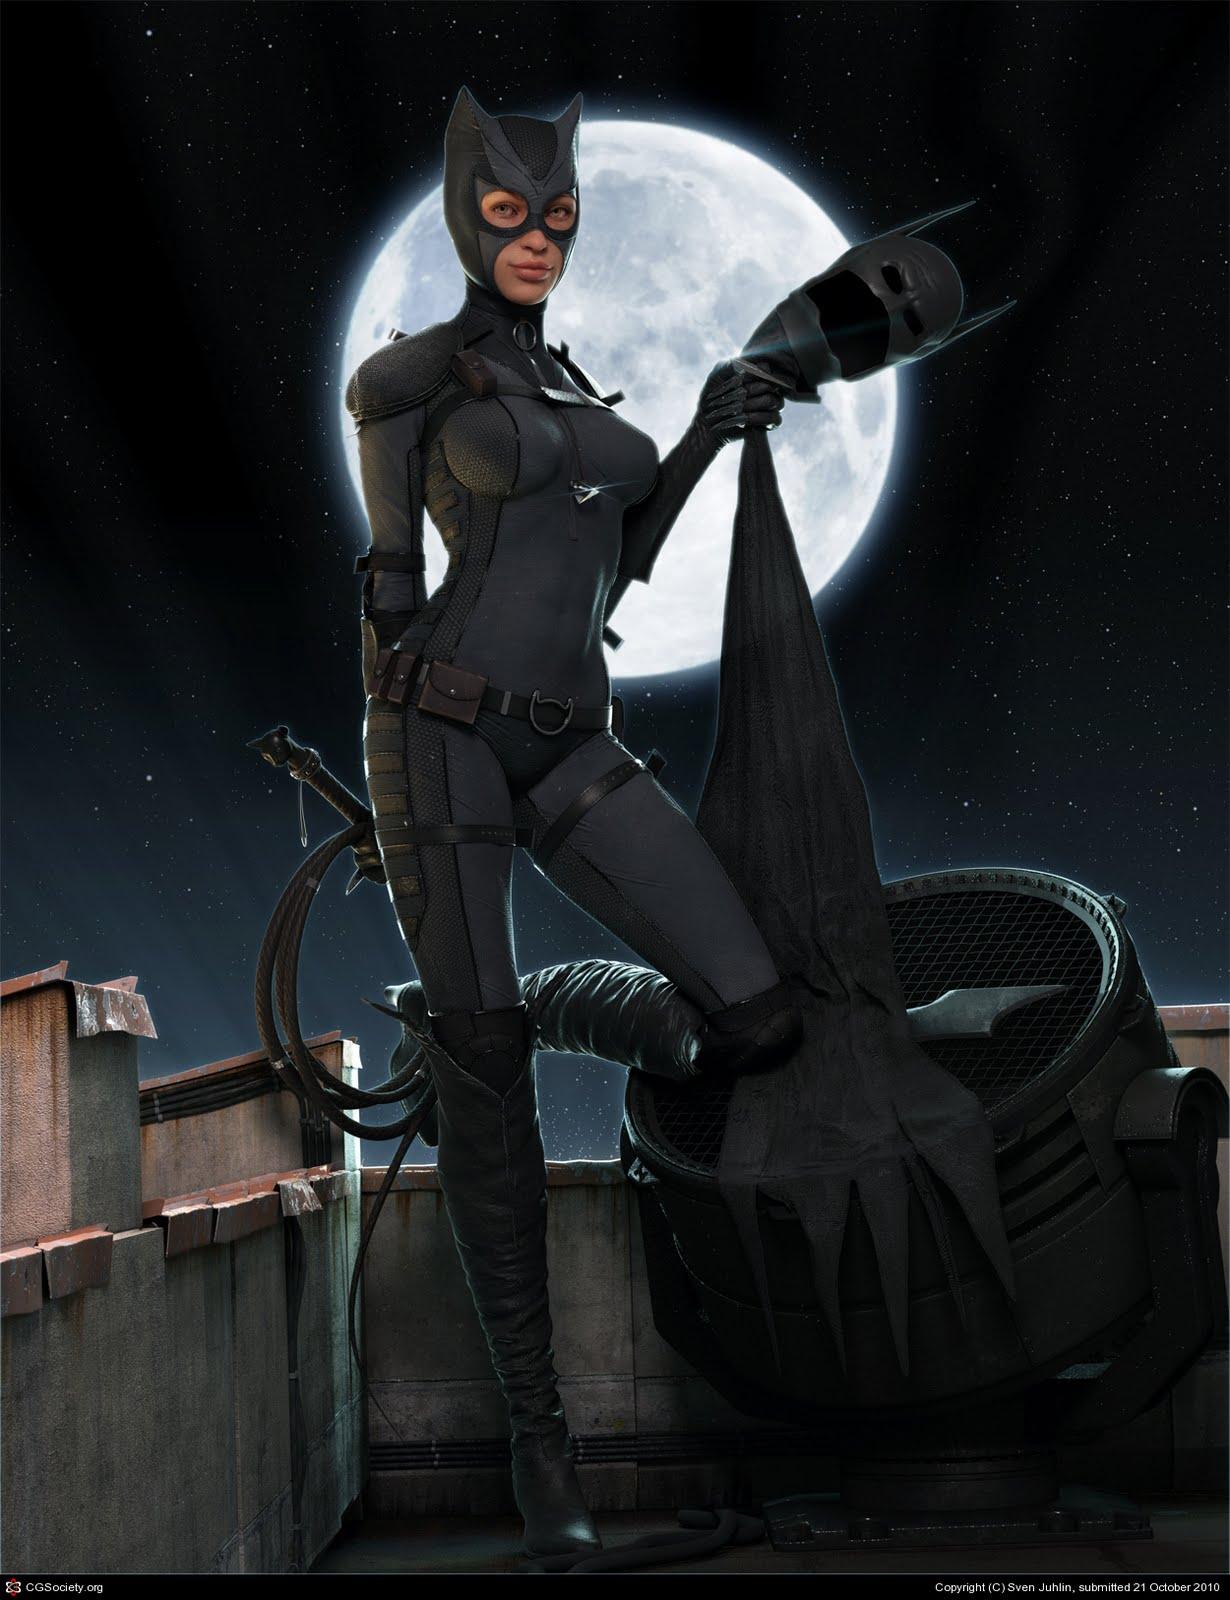 http://3.bp.blogspot.com/-6S3xDFg8gSo/TkmLwM22-6I/AAAAAAAABYQ/Cu1JKymD5o0/s1600/sven-juhlin-catwoman-3d-cg-art.jpg